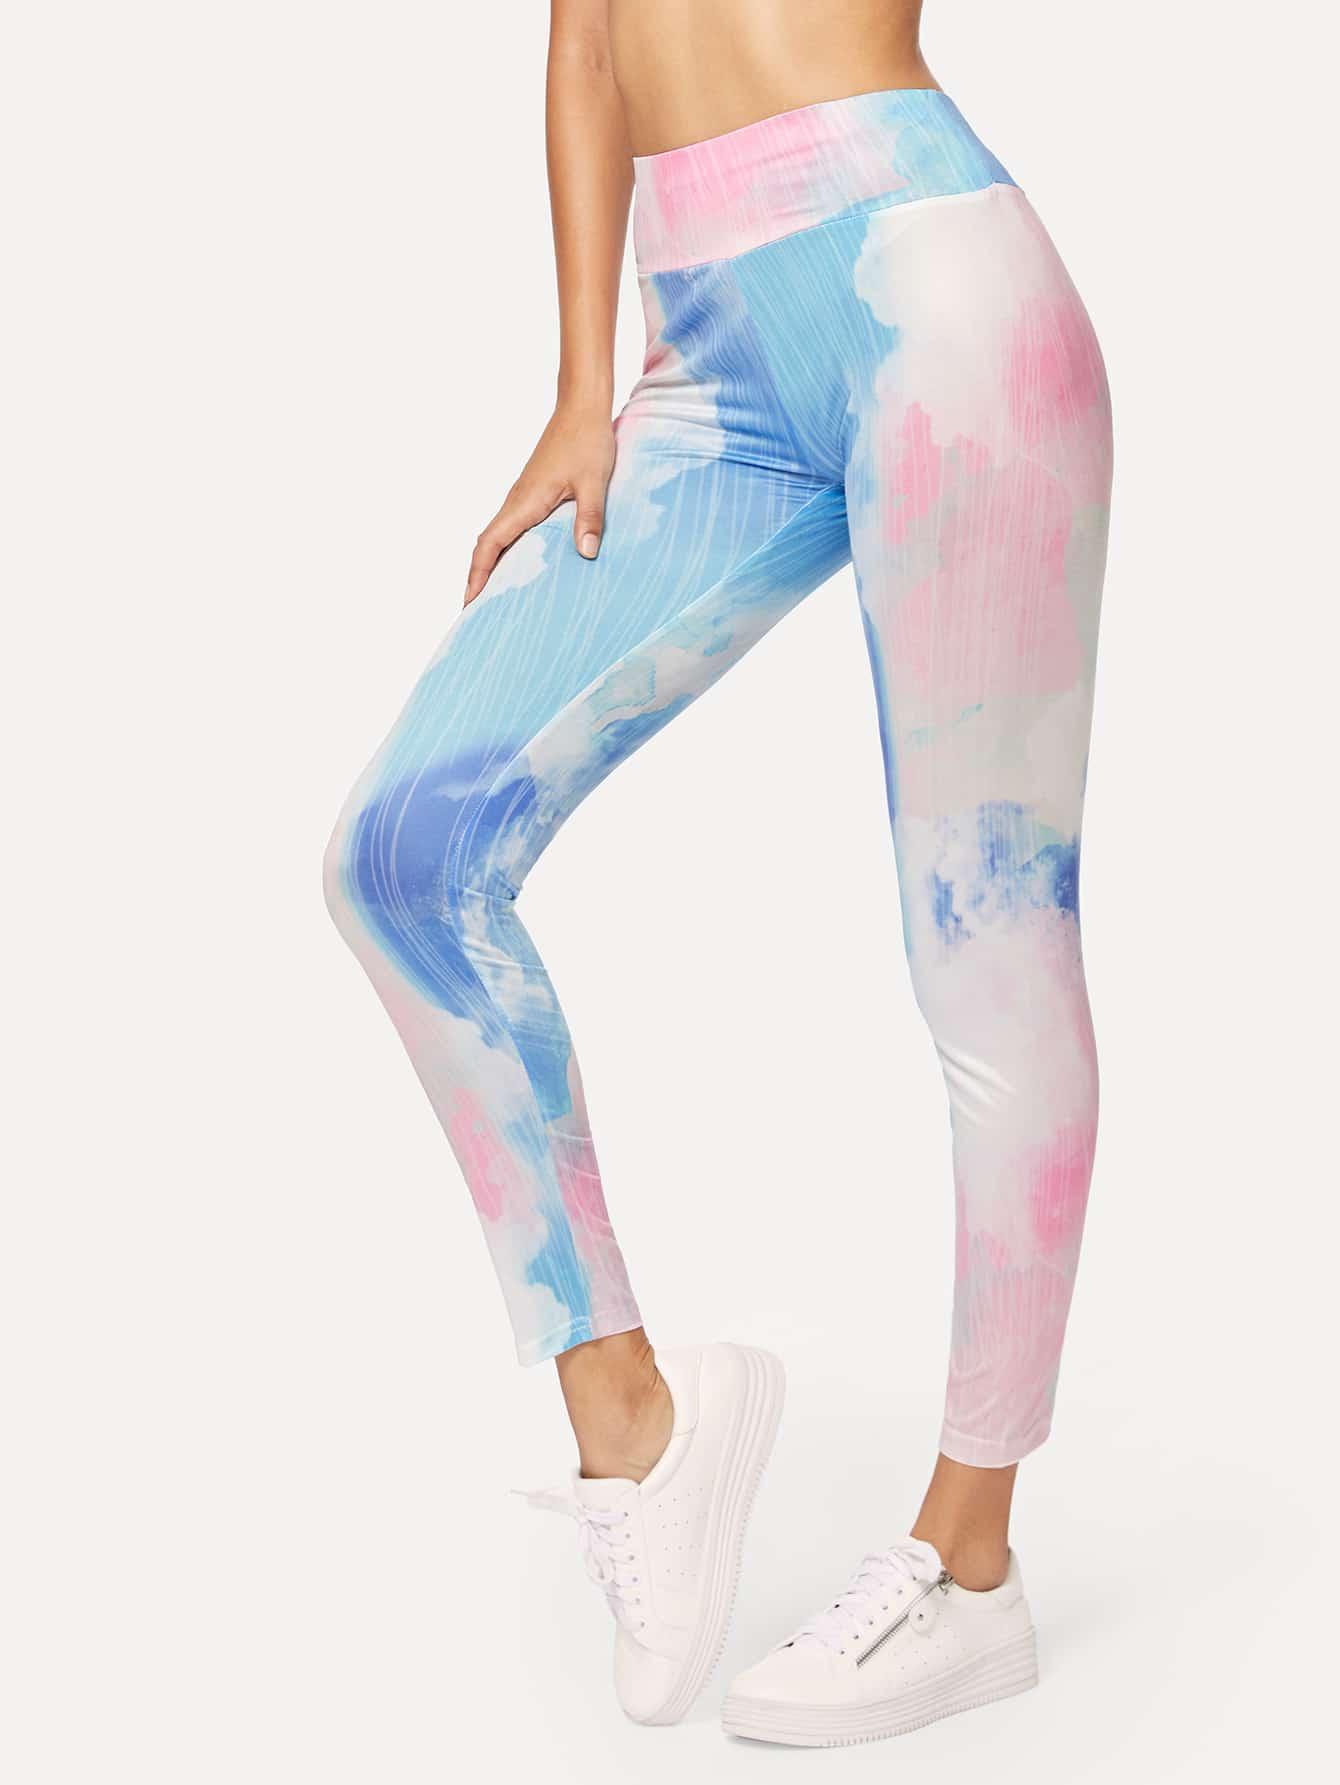 Wide Waist Tie Dye Leggings ink pattern tie dye yoga leggings